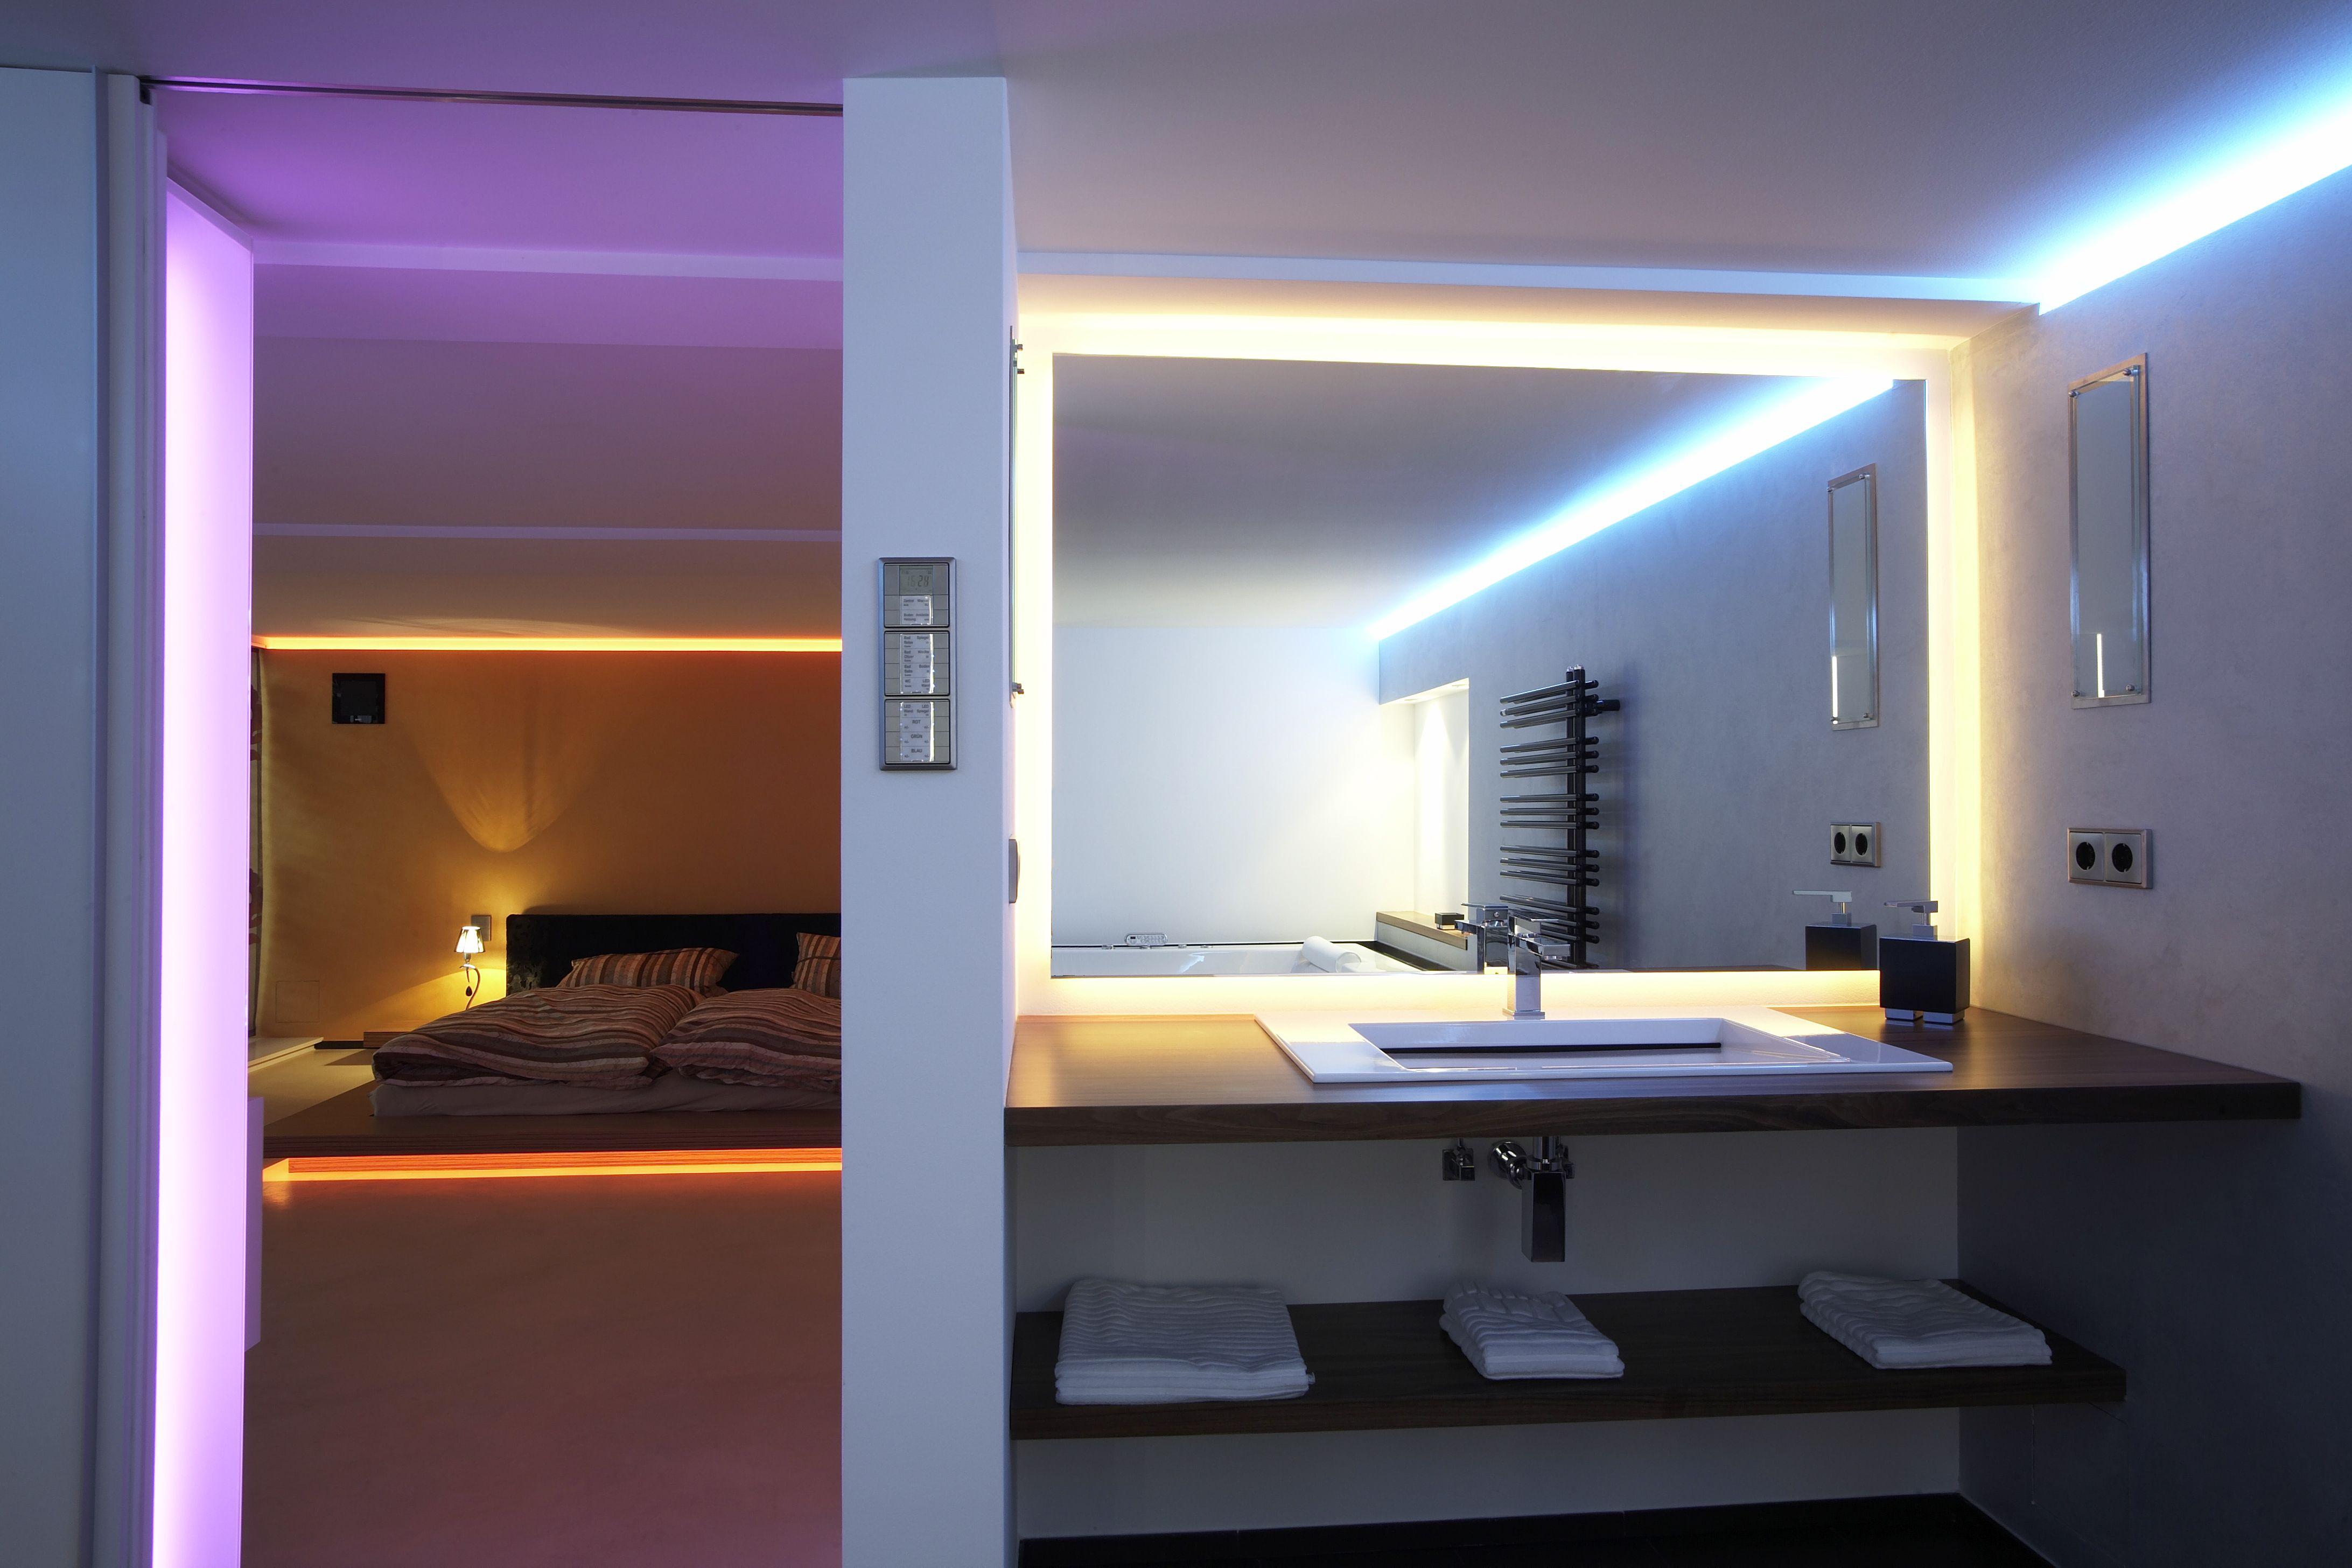 Showroom, Bad/Schlafzimmer | Elektro-Showroom | Pinterest | Showroom